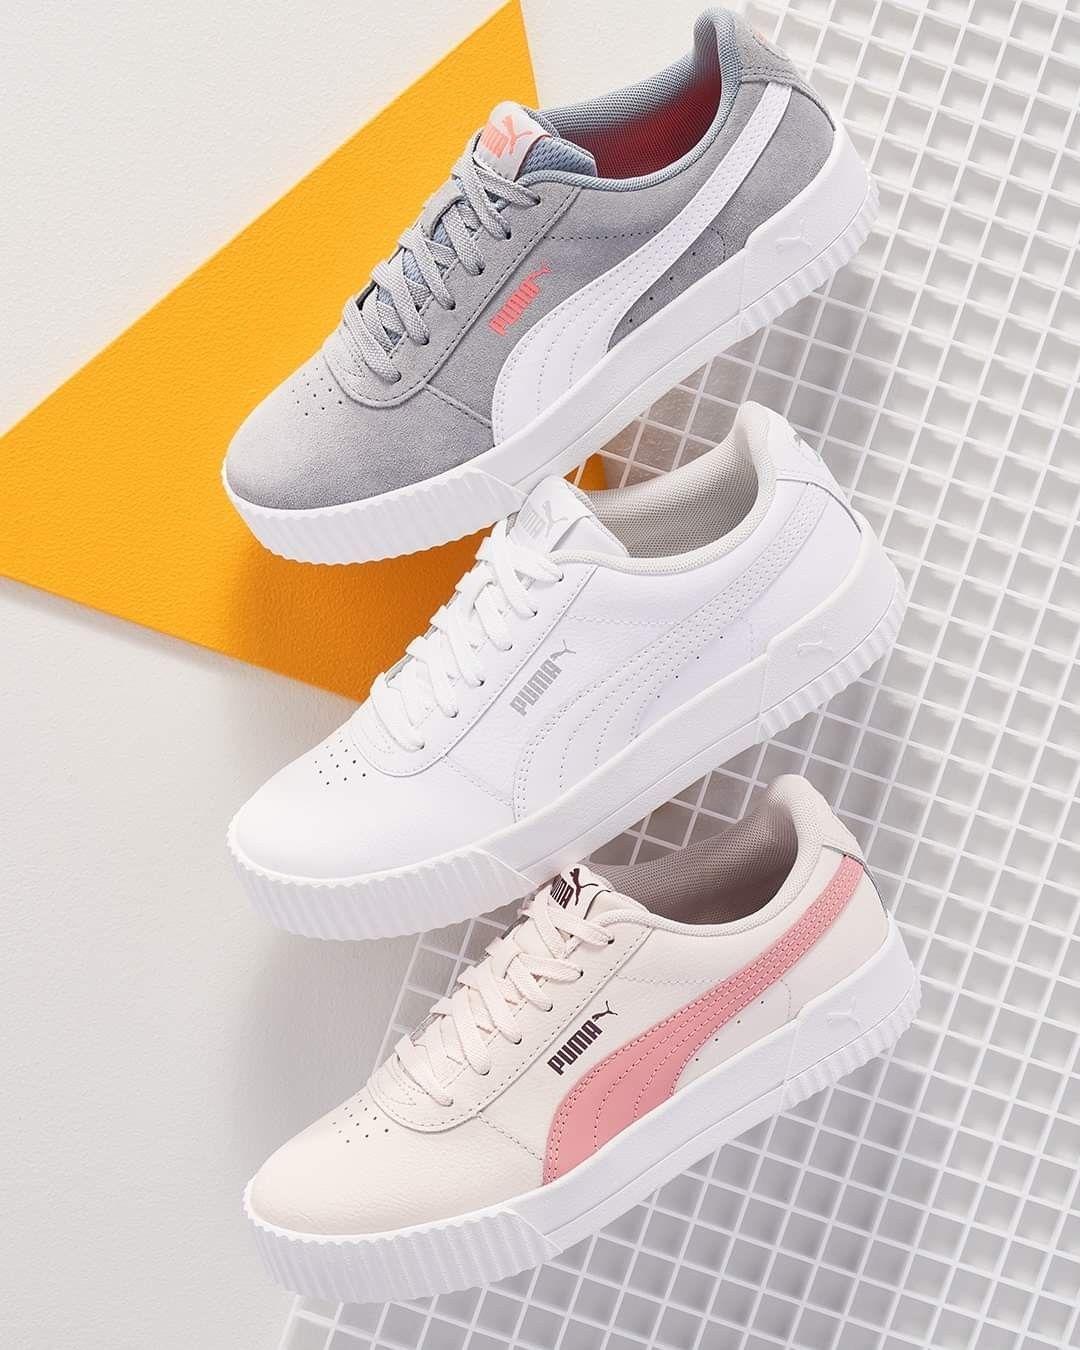 Pin de Peppin Geradts em Sneakersss :) em 2020 | Tênis puma